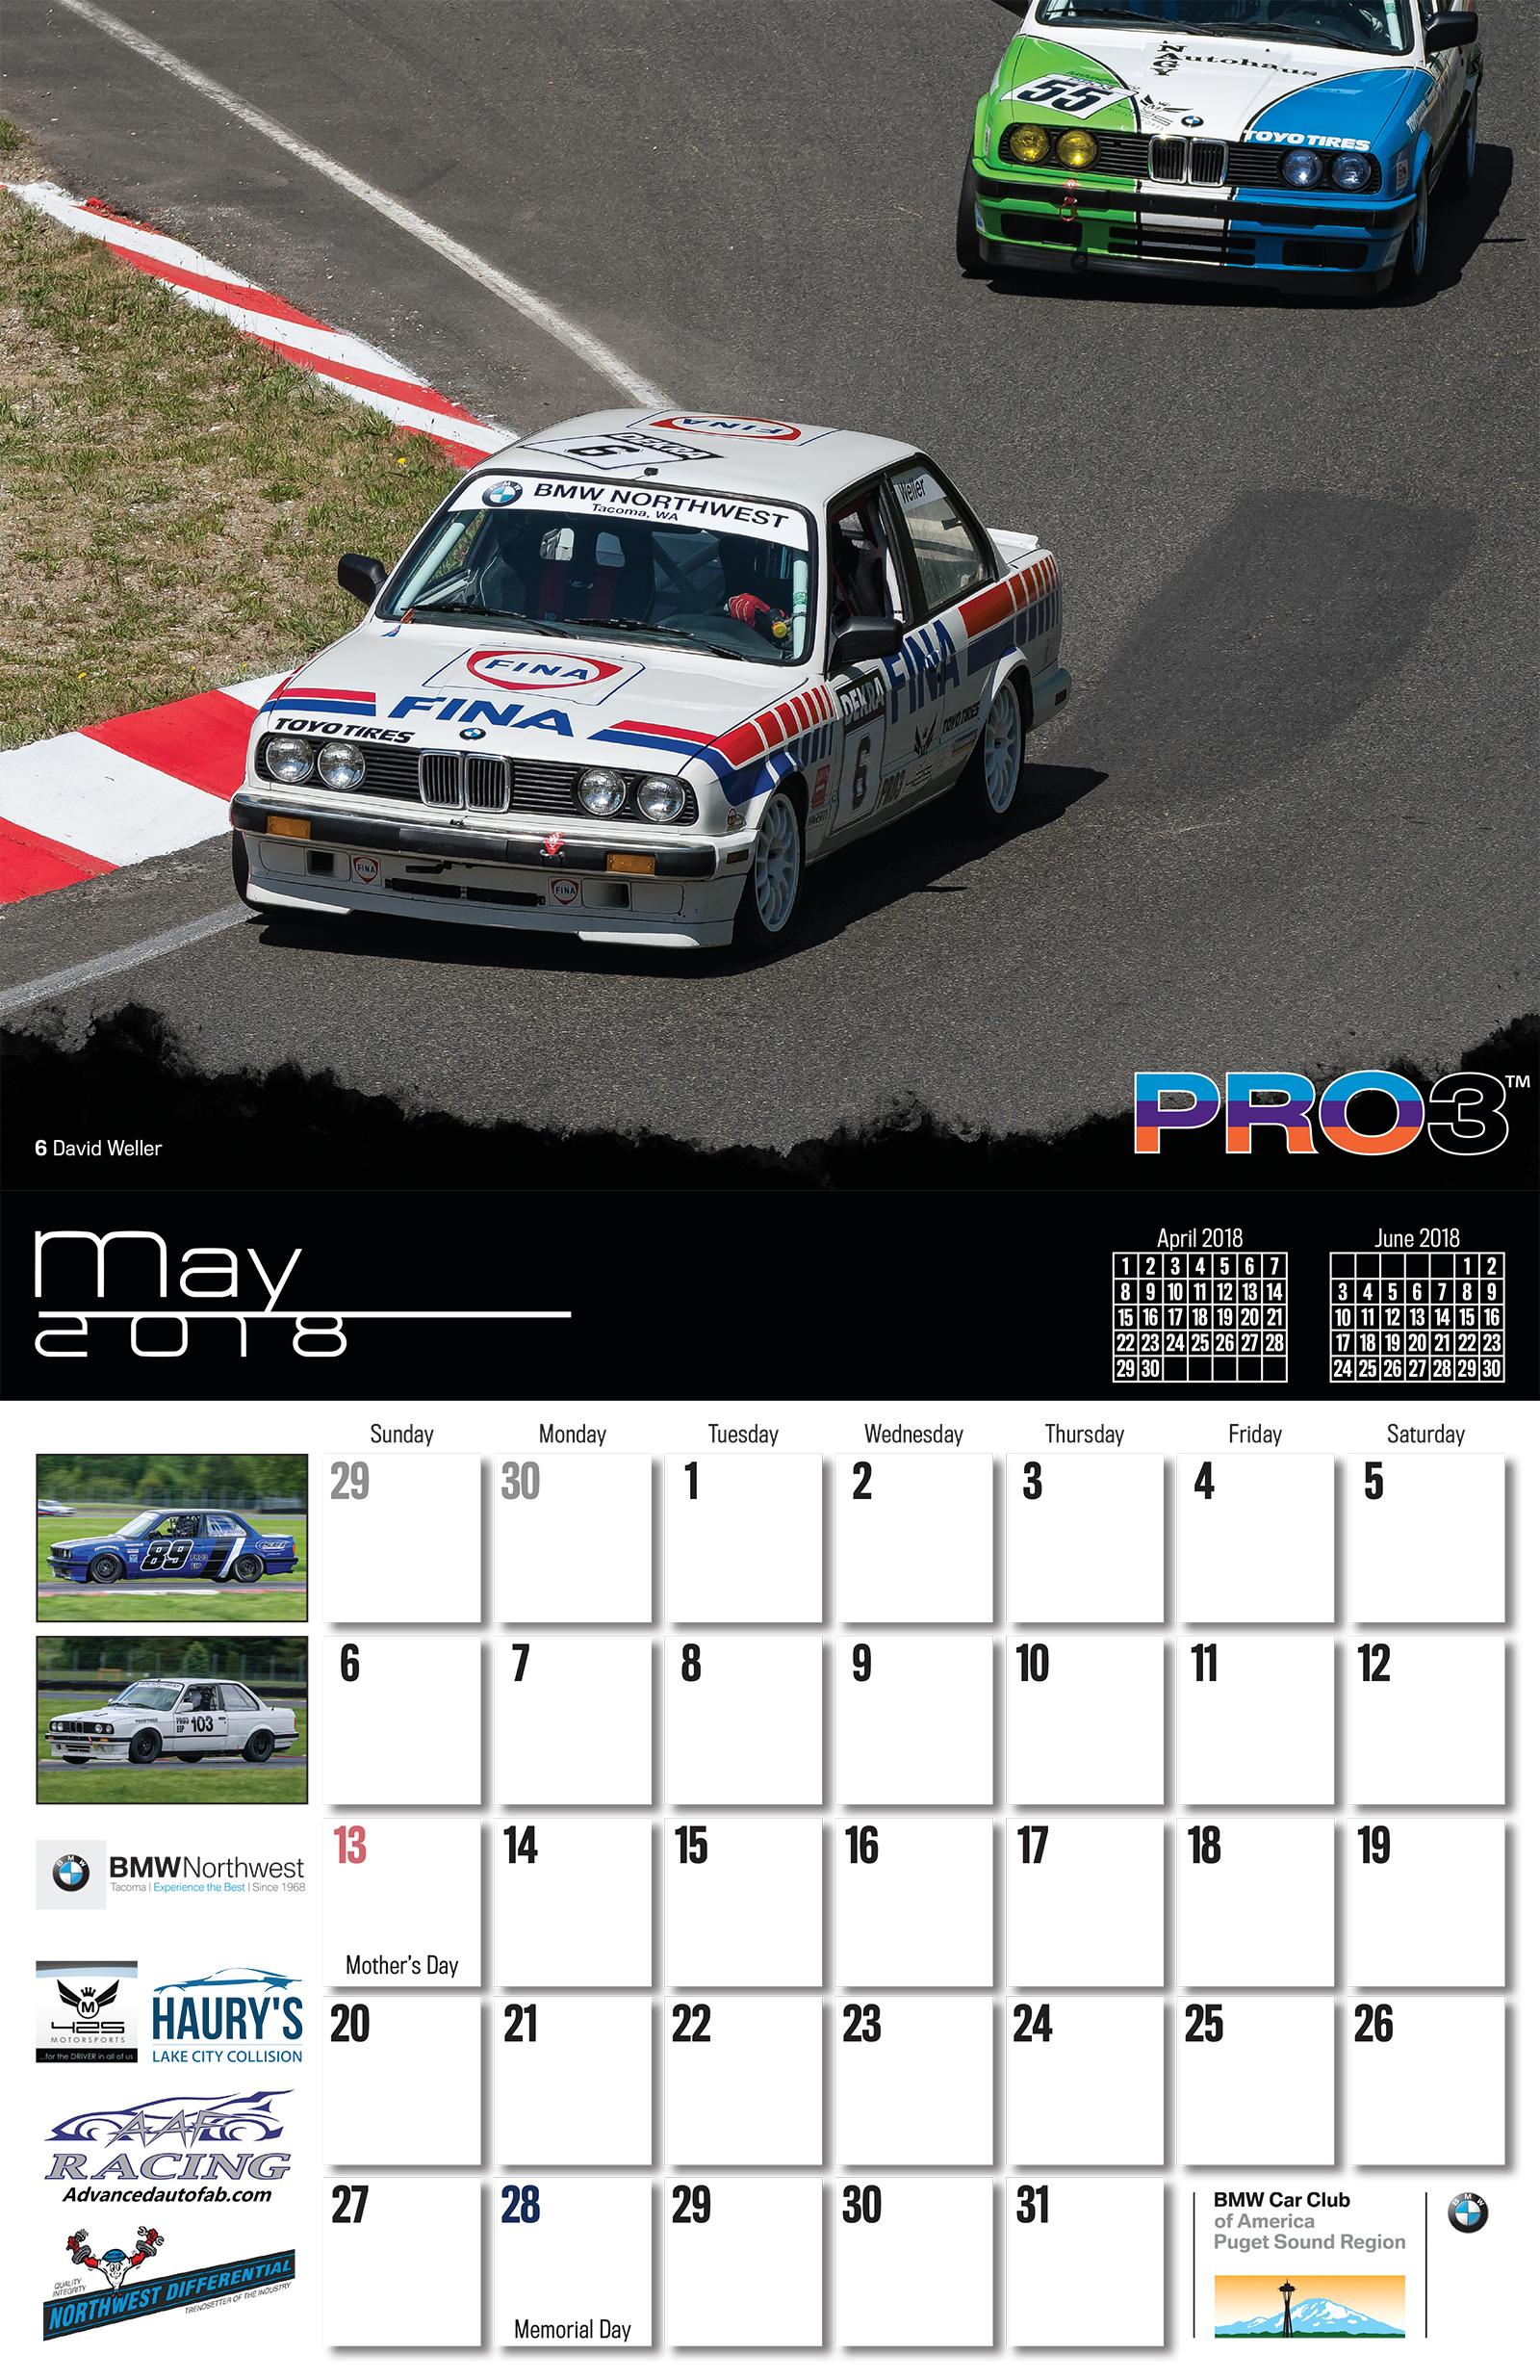 PRO3_Calendar_2018_05-May.jpg